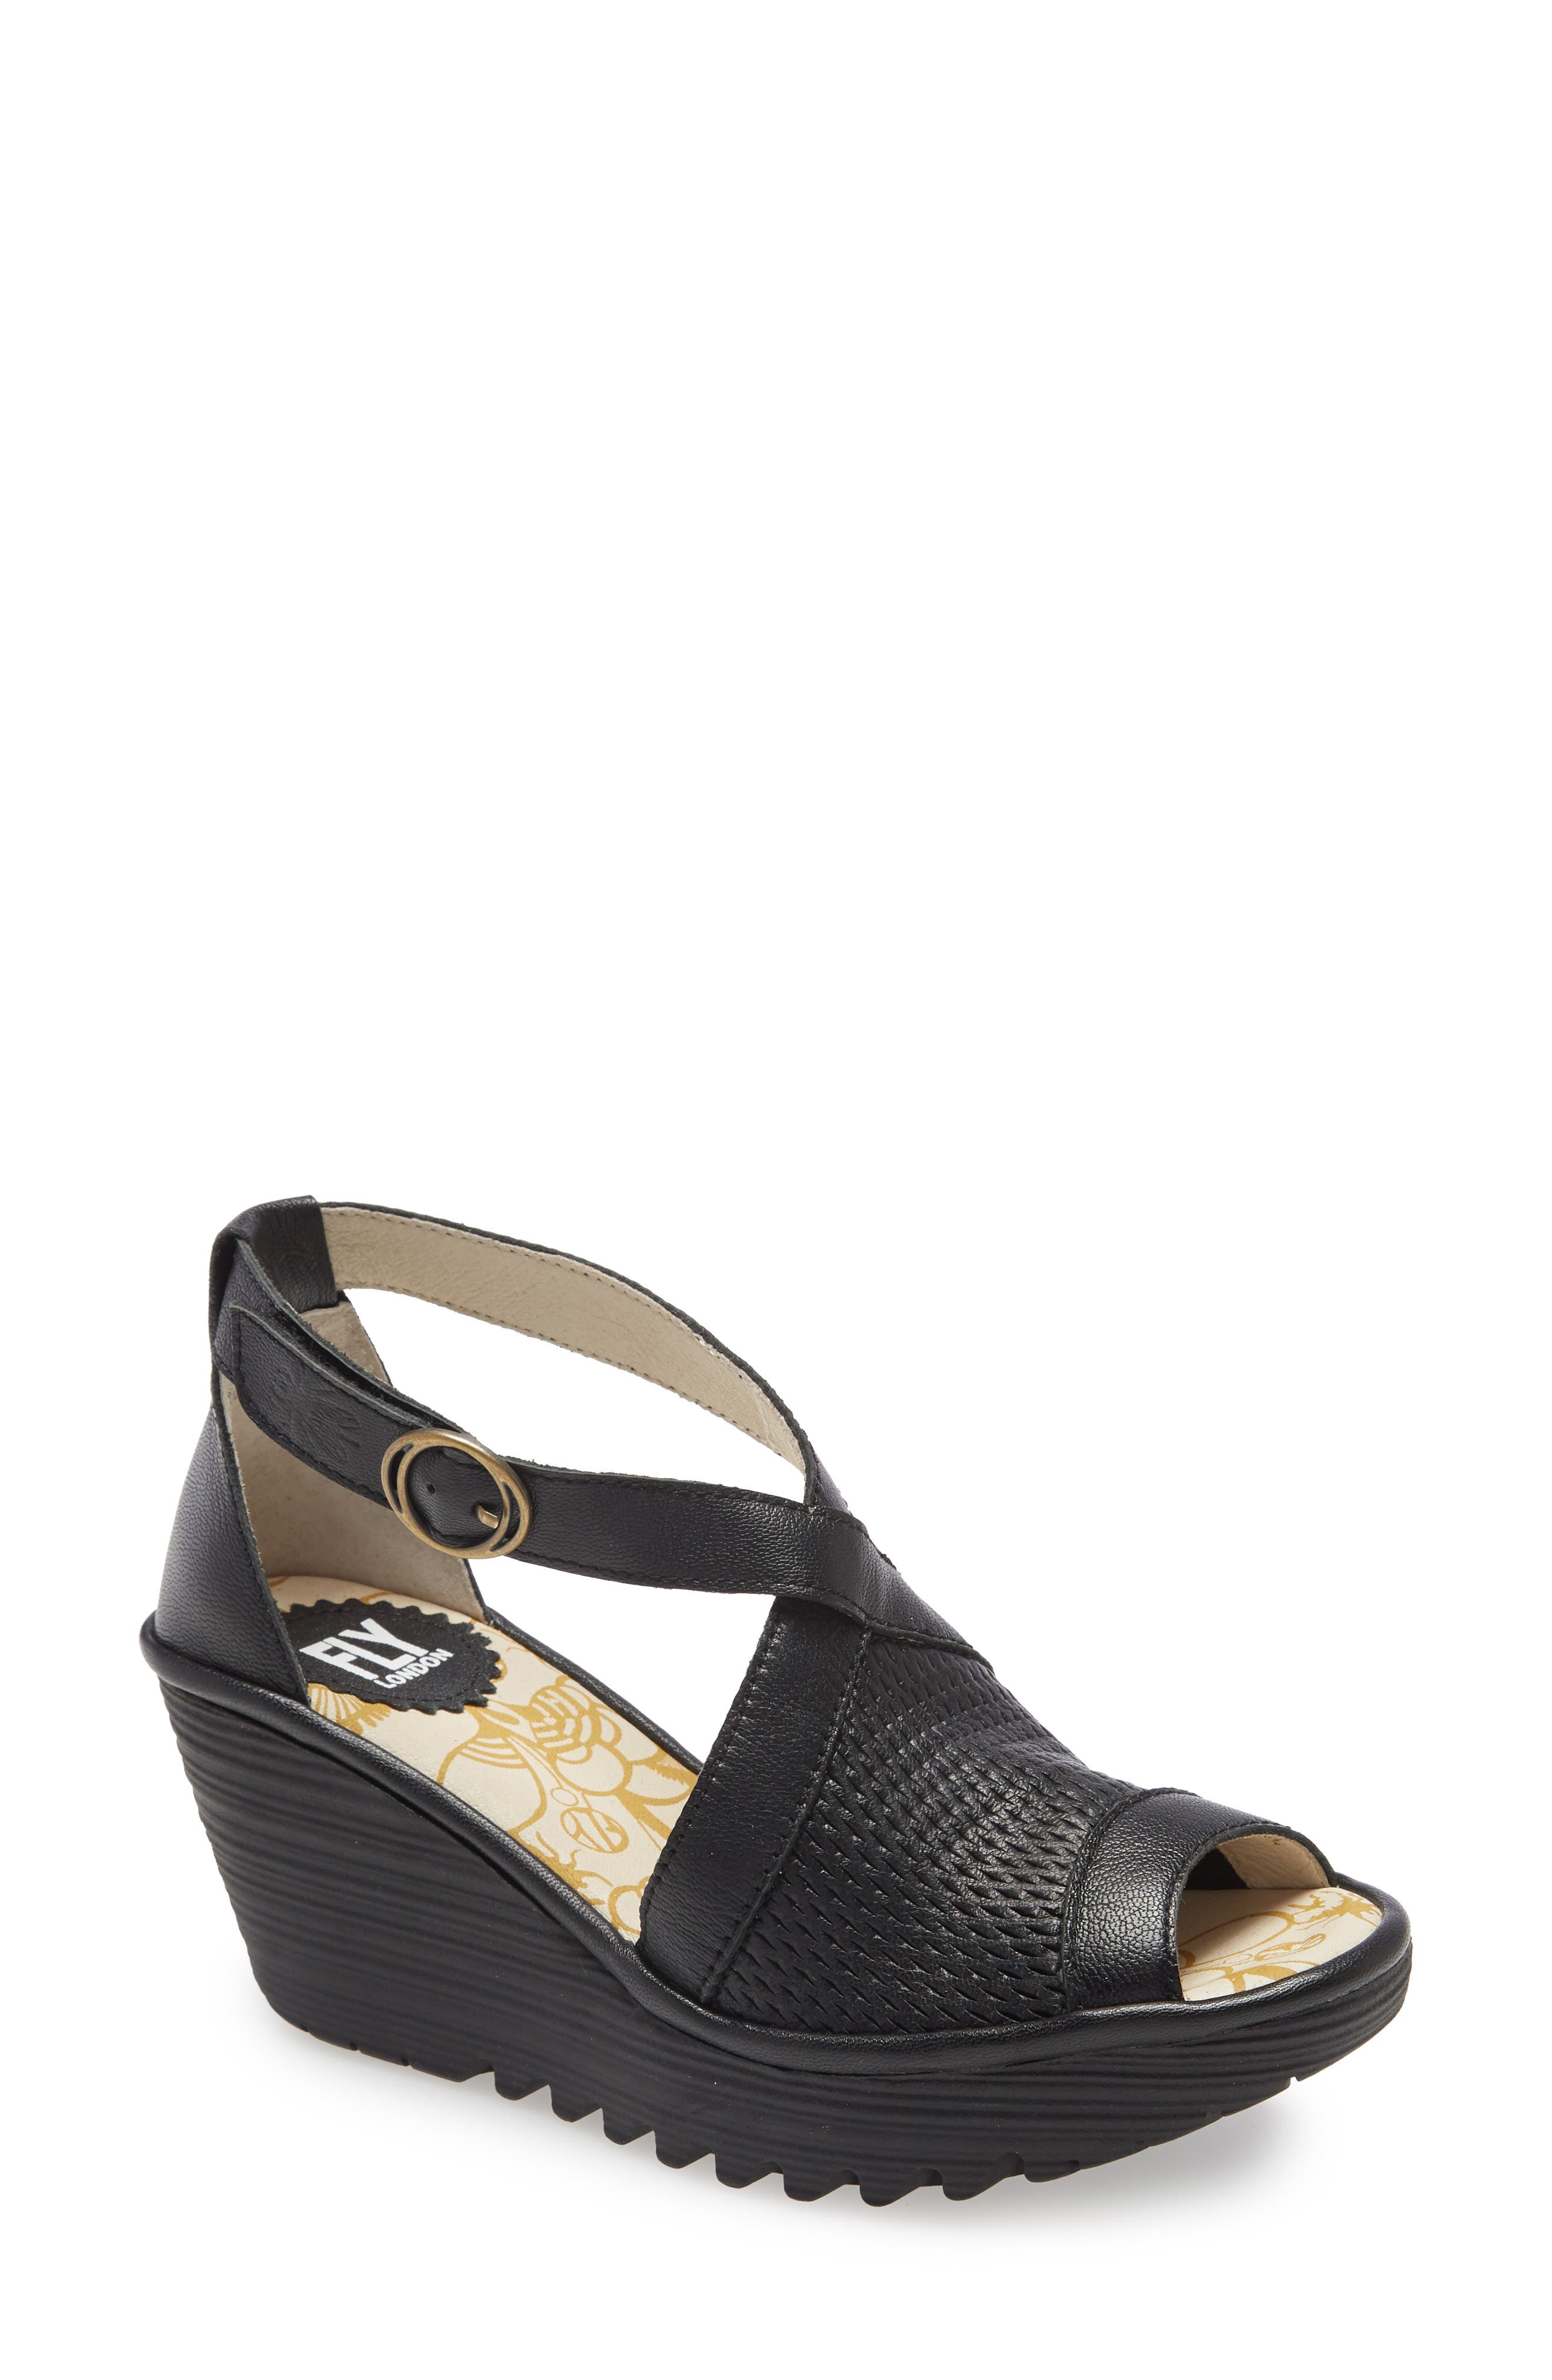 Fly London Women/'s Trim Leather Black Wegde Heeled Sandals